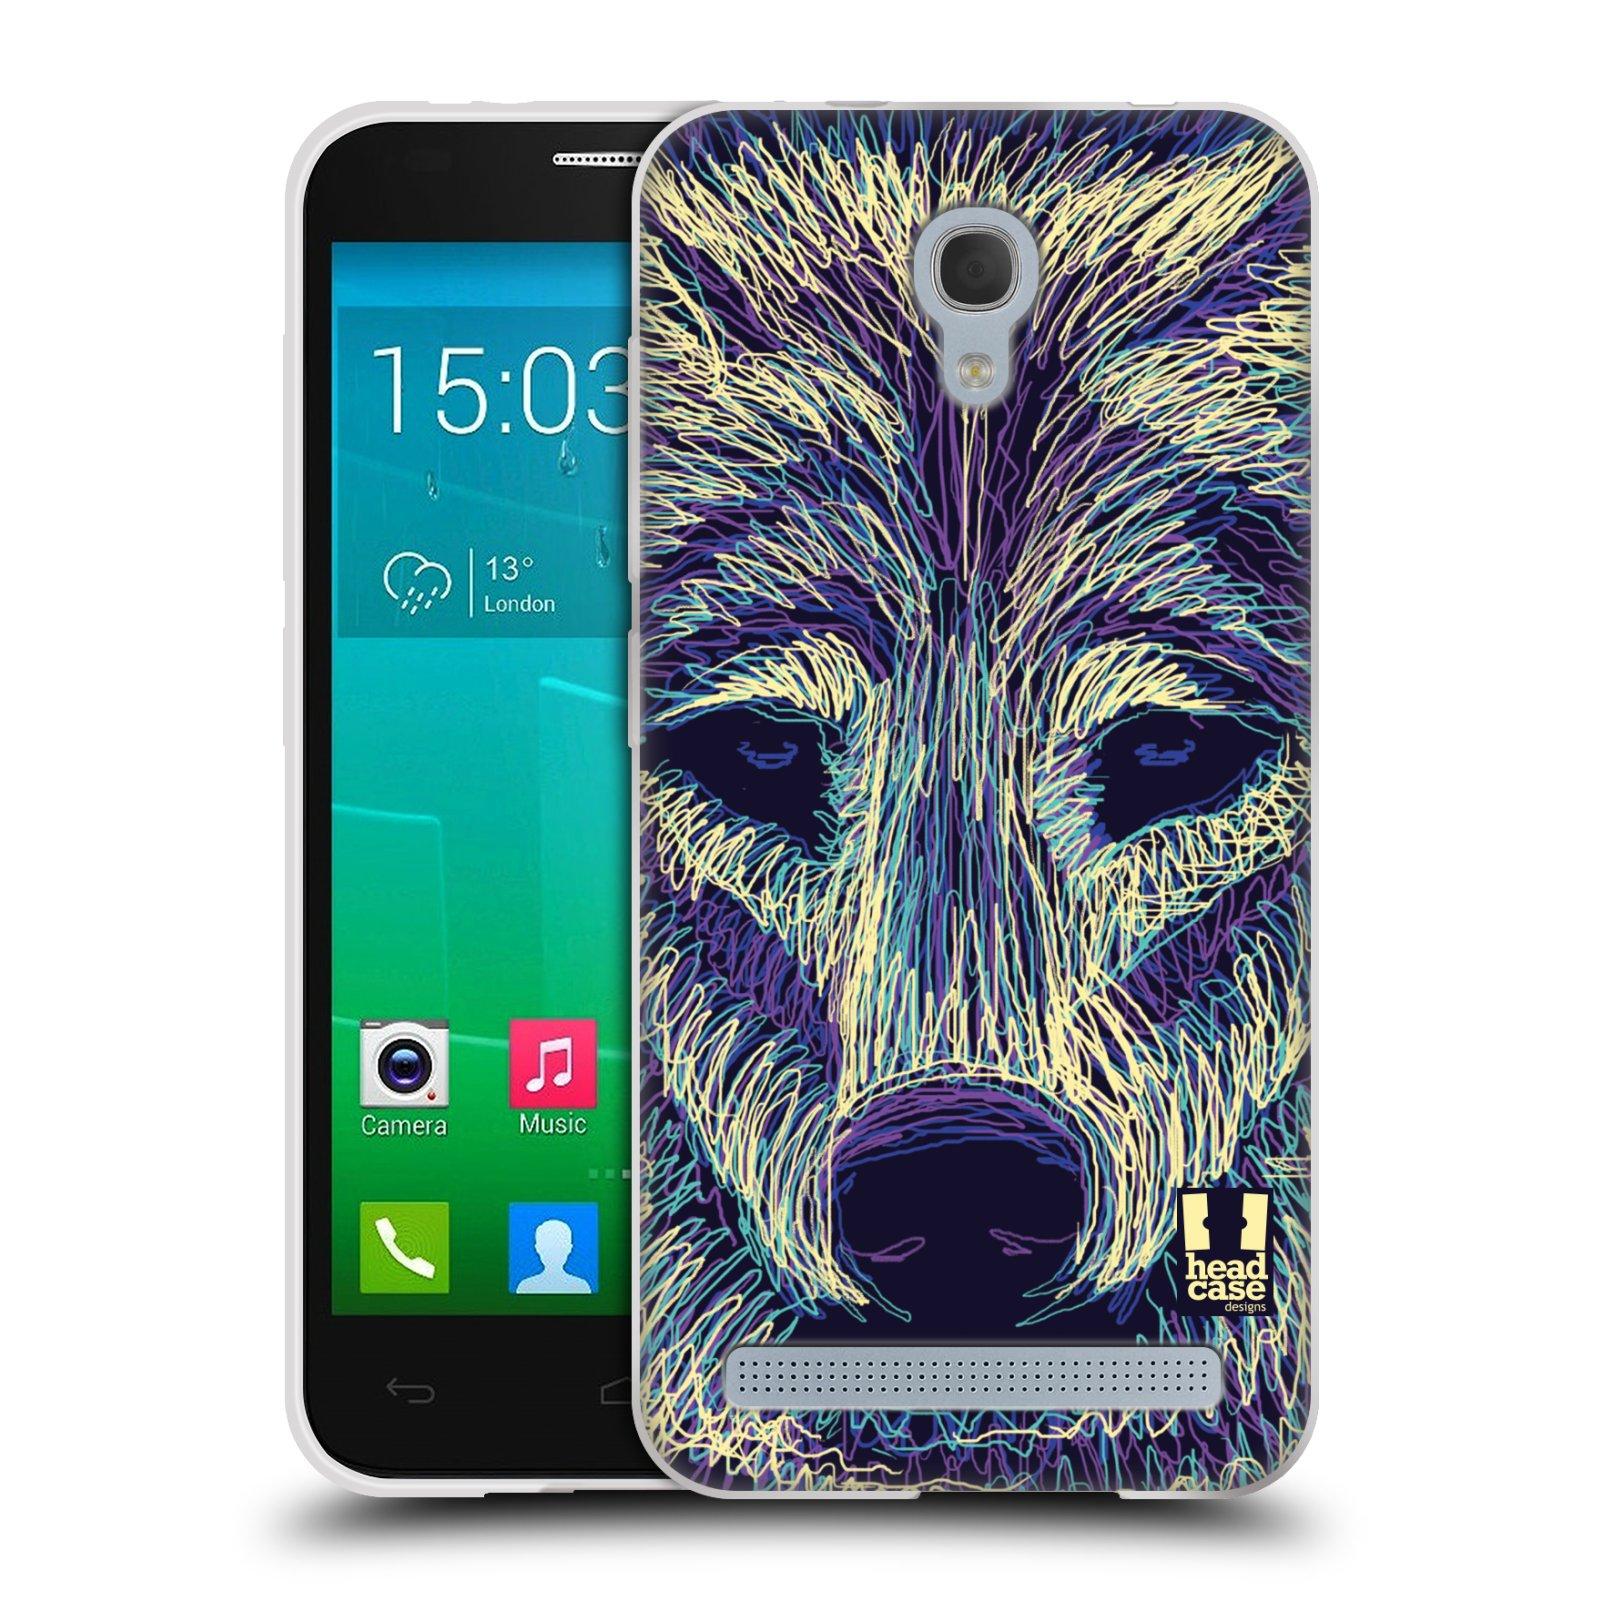 HEAD CASE silikonový obal na mobil Alcatel Idol 2 MINI S 6036Y vzor zvíře čmáranice vlk